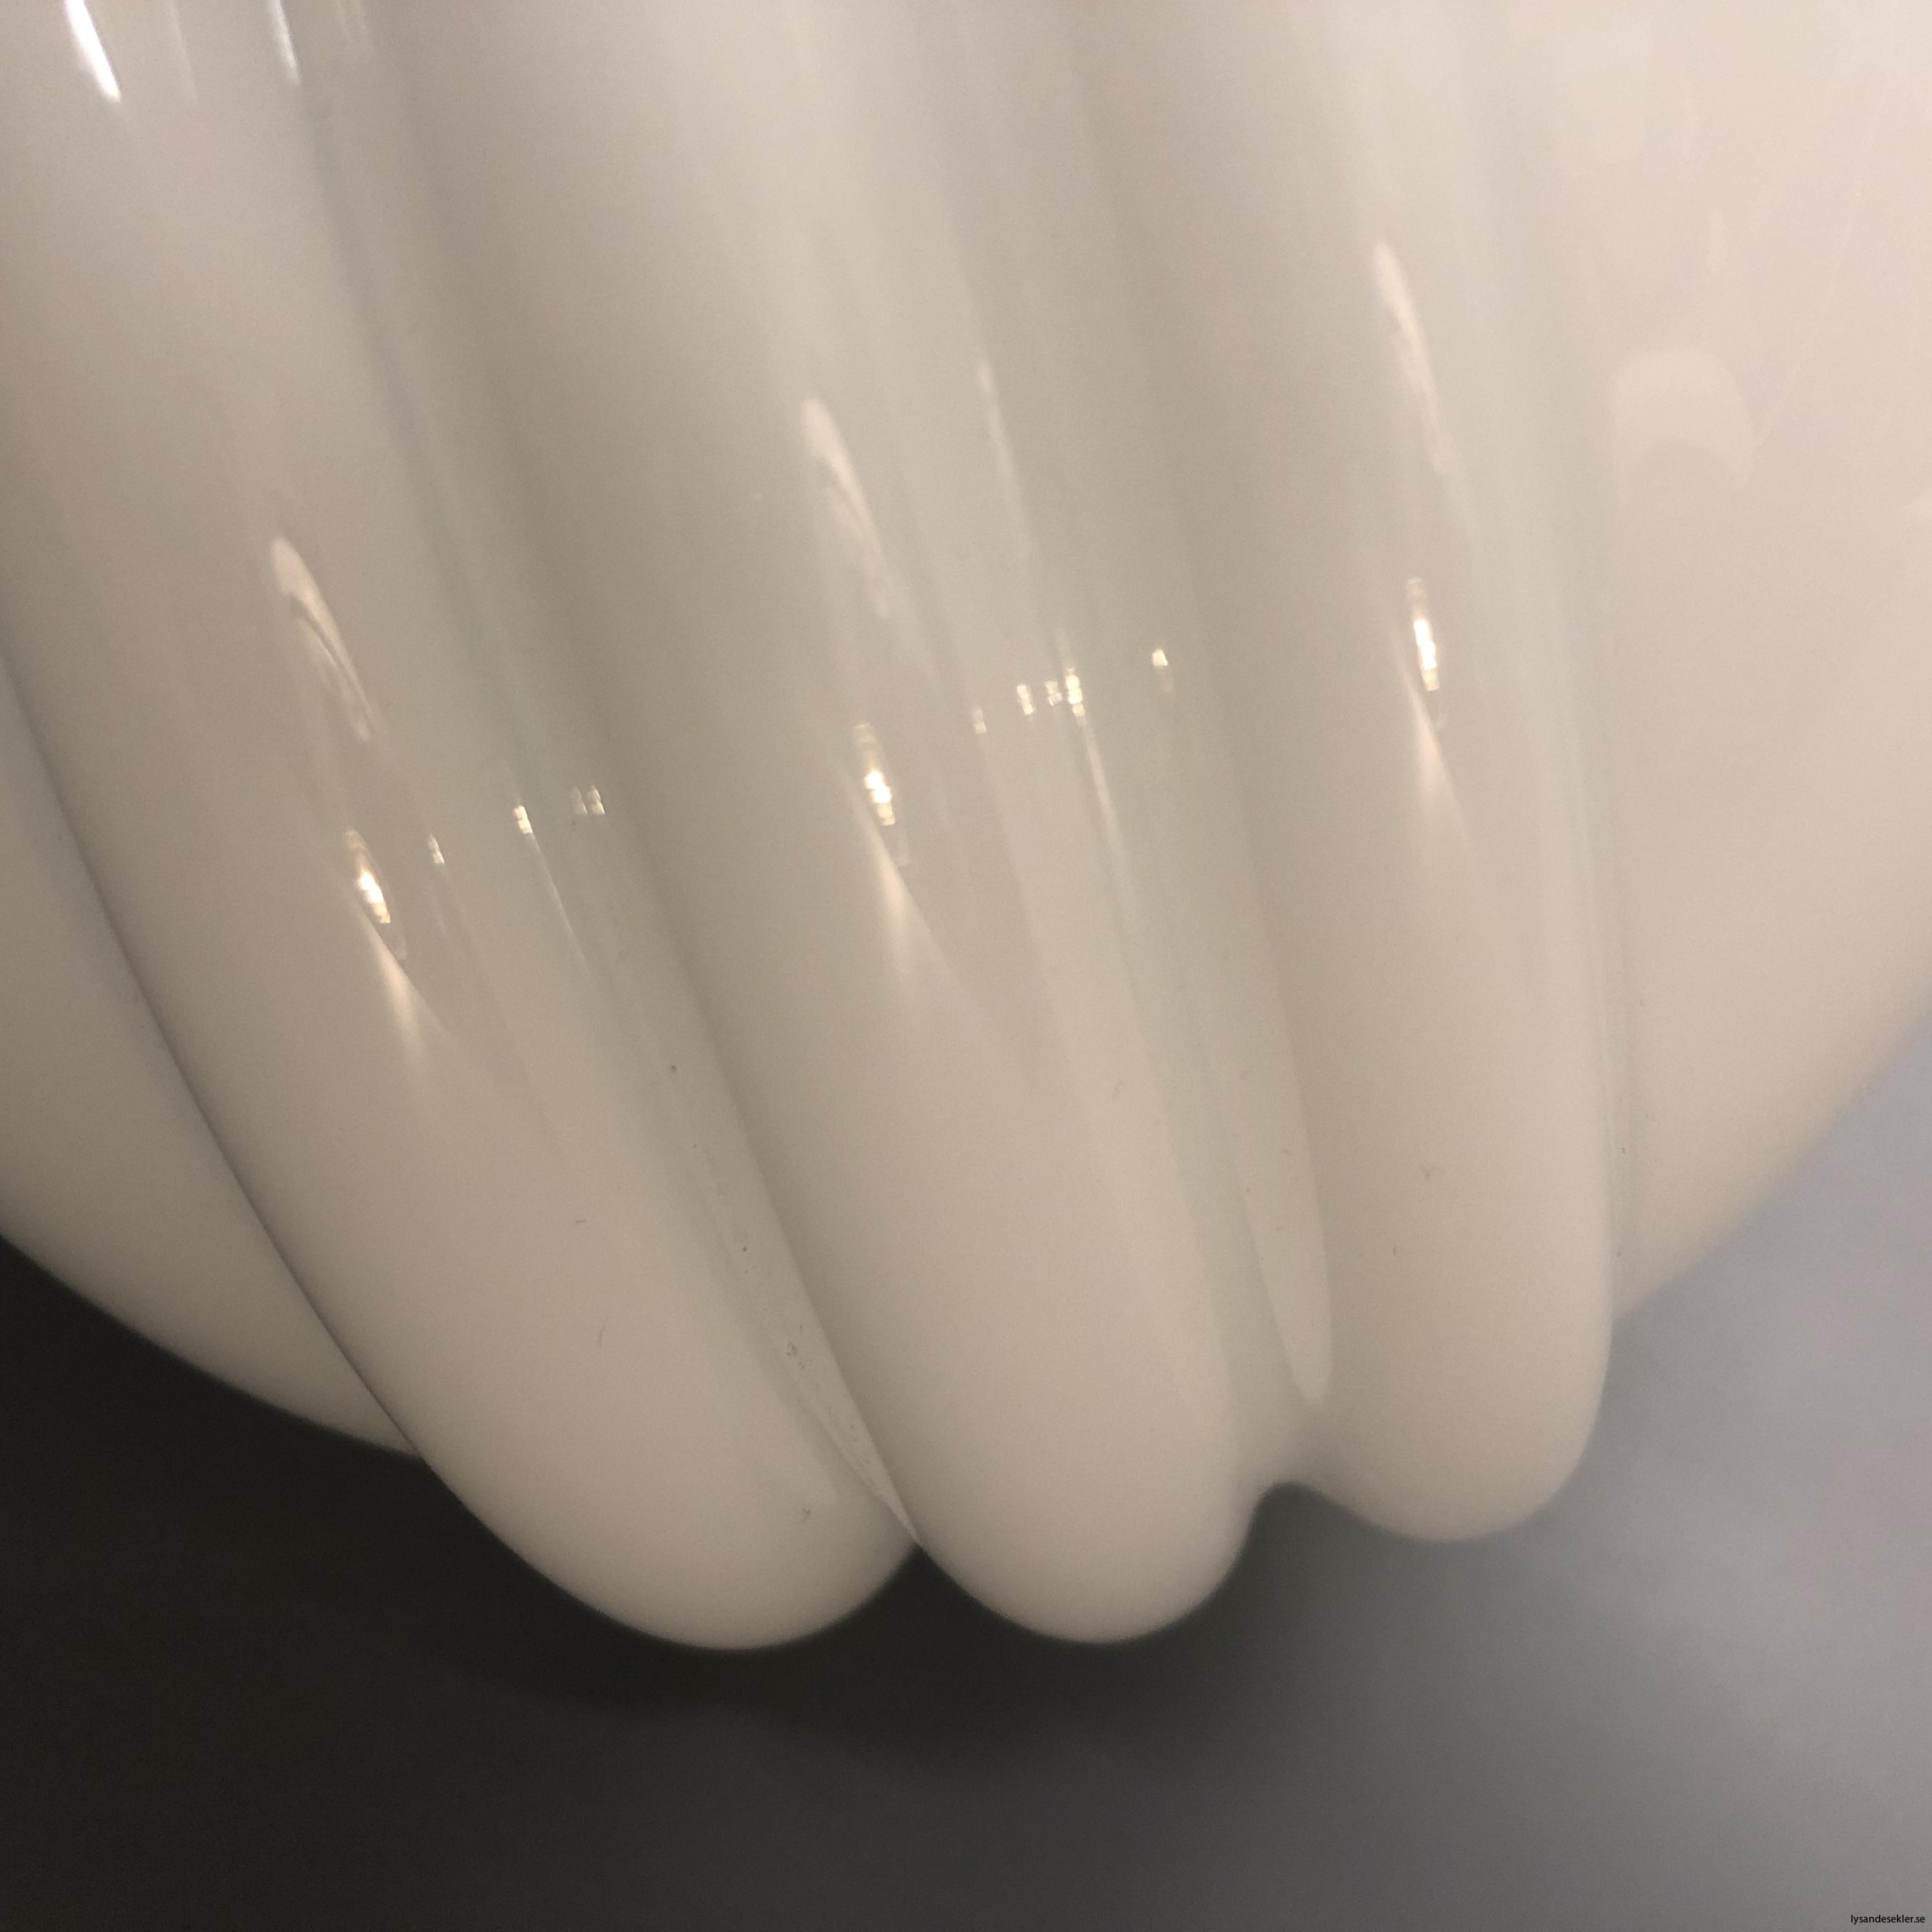 klotkupa klotkupor opalvit vit vita lampkupa klot klotform9